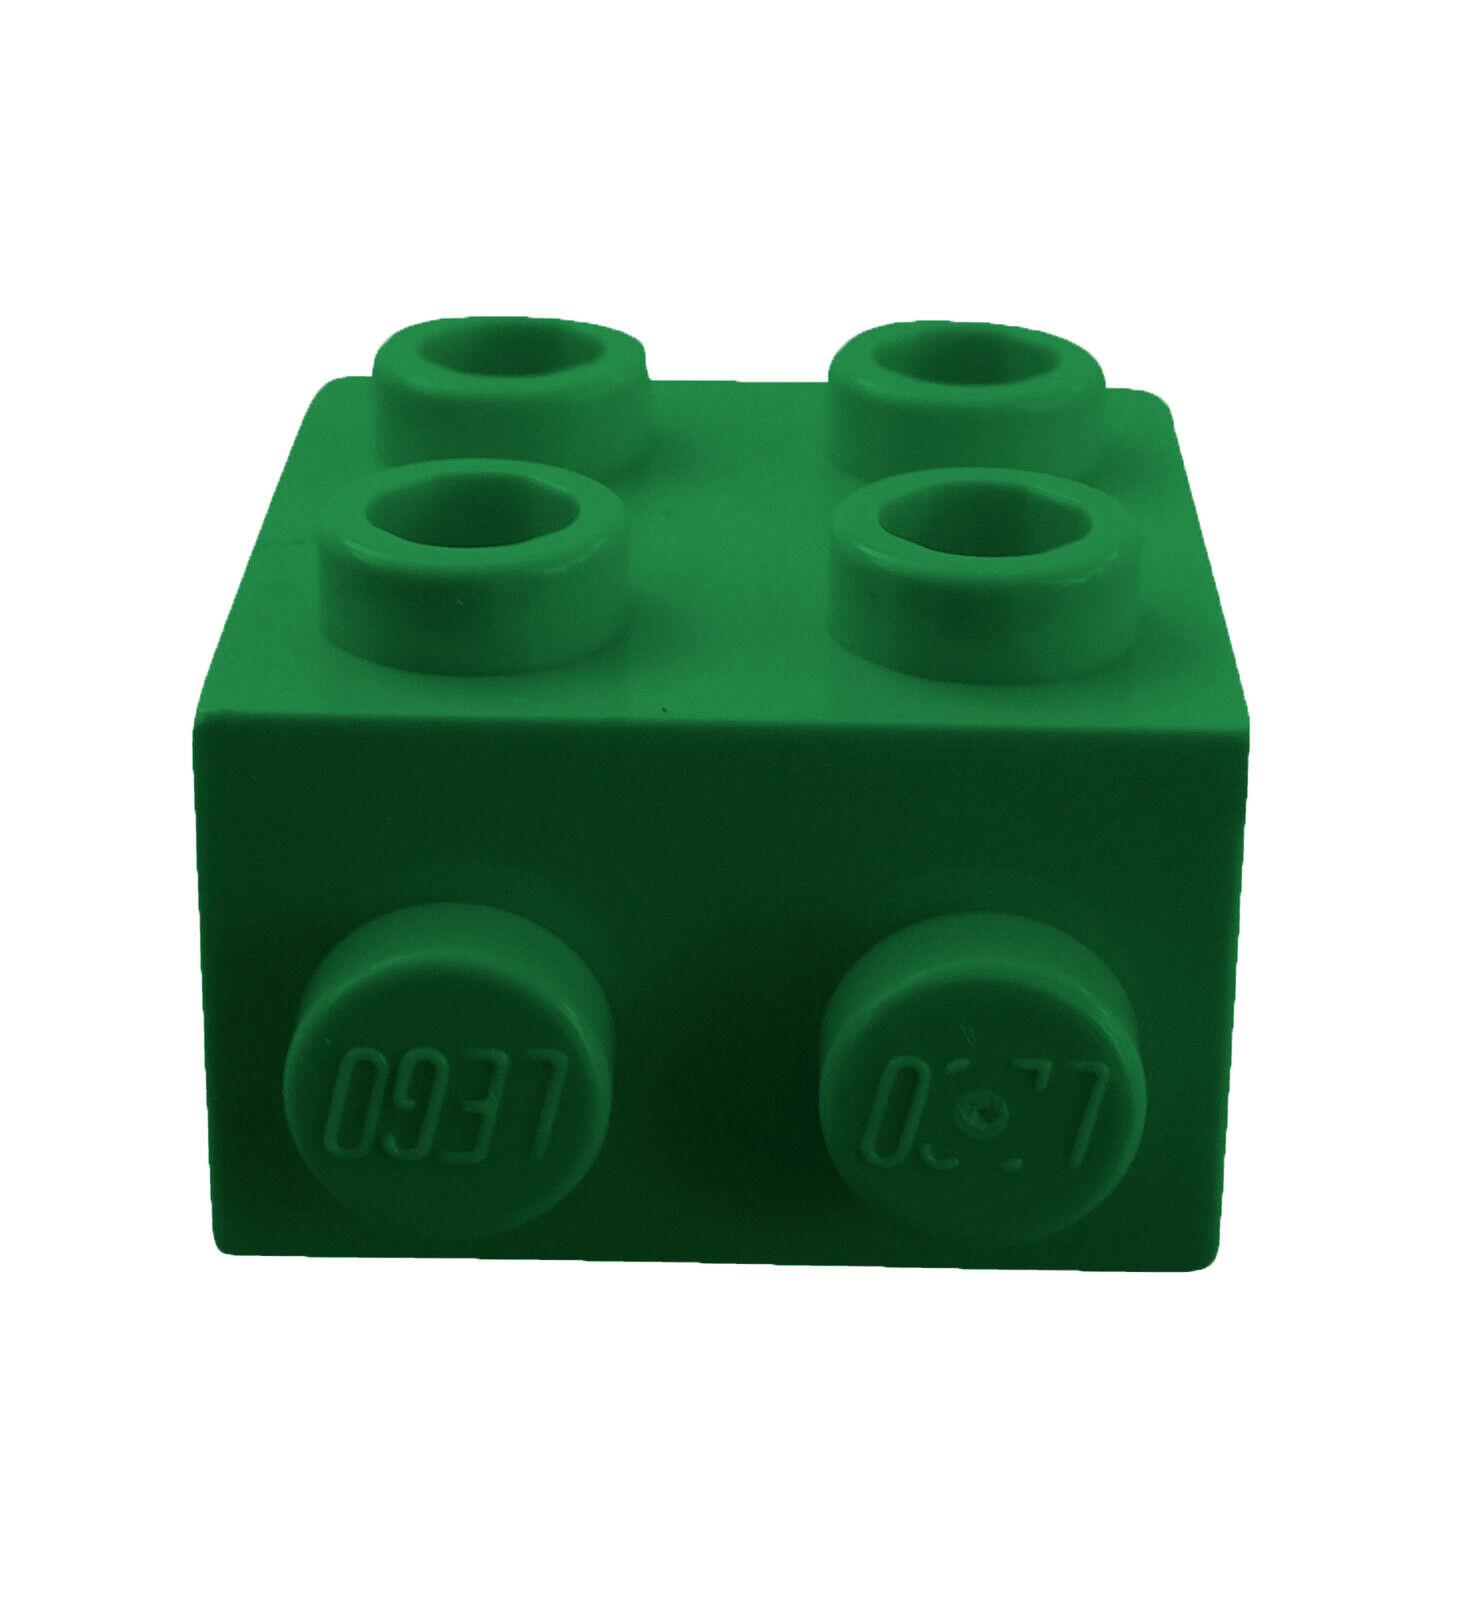 Lego 10 x Angle 1x2-2x2 in Beige//Tan 44728 Konverterplatte Bracket New